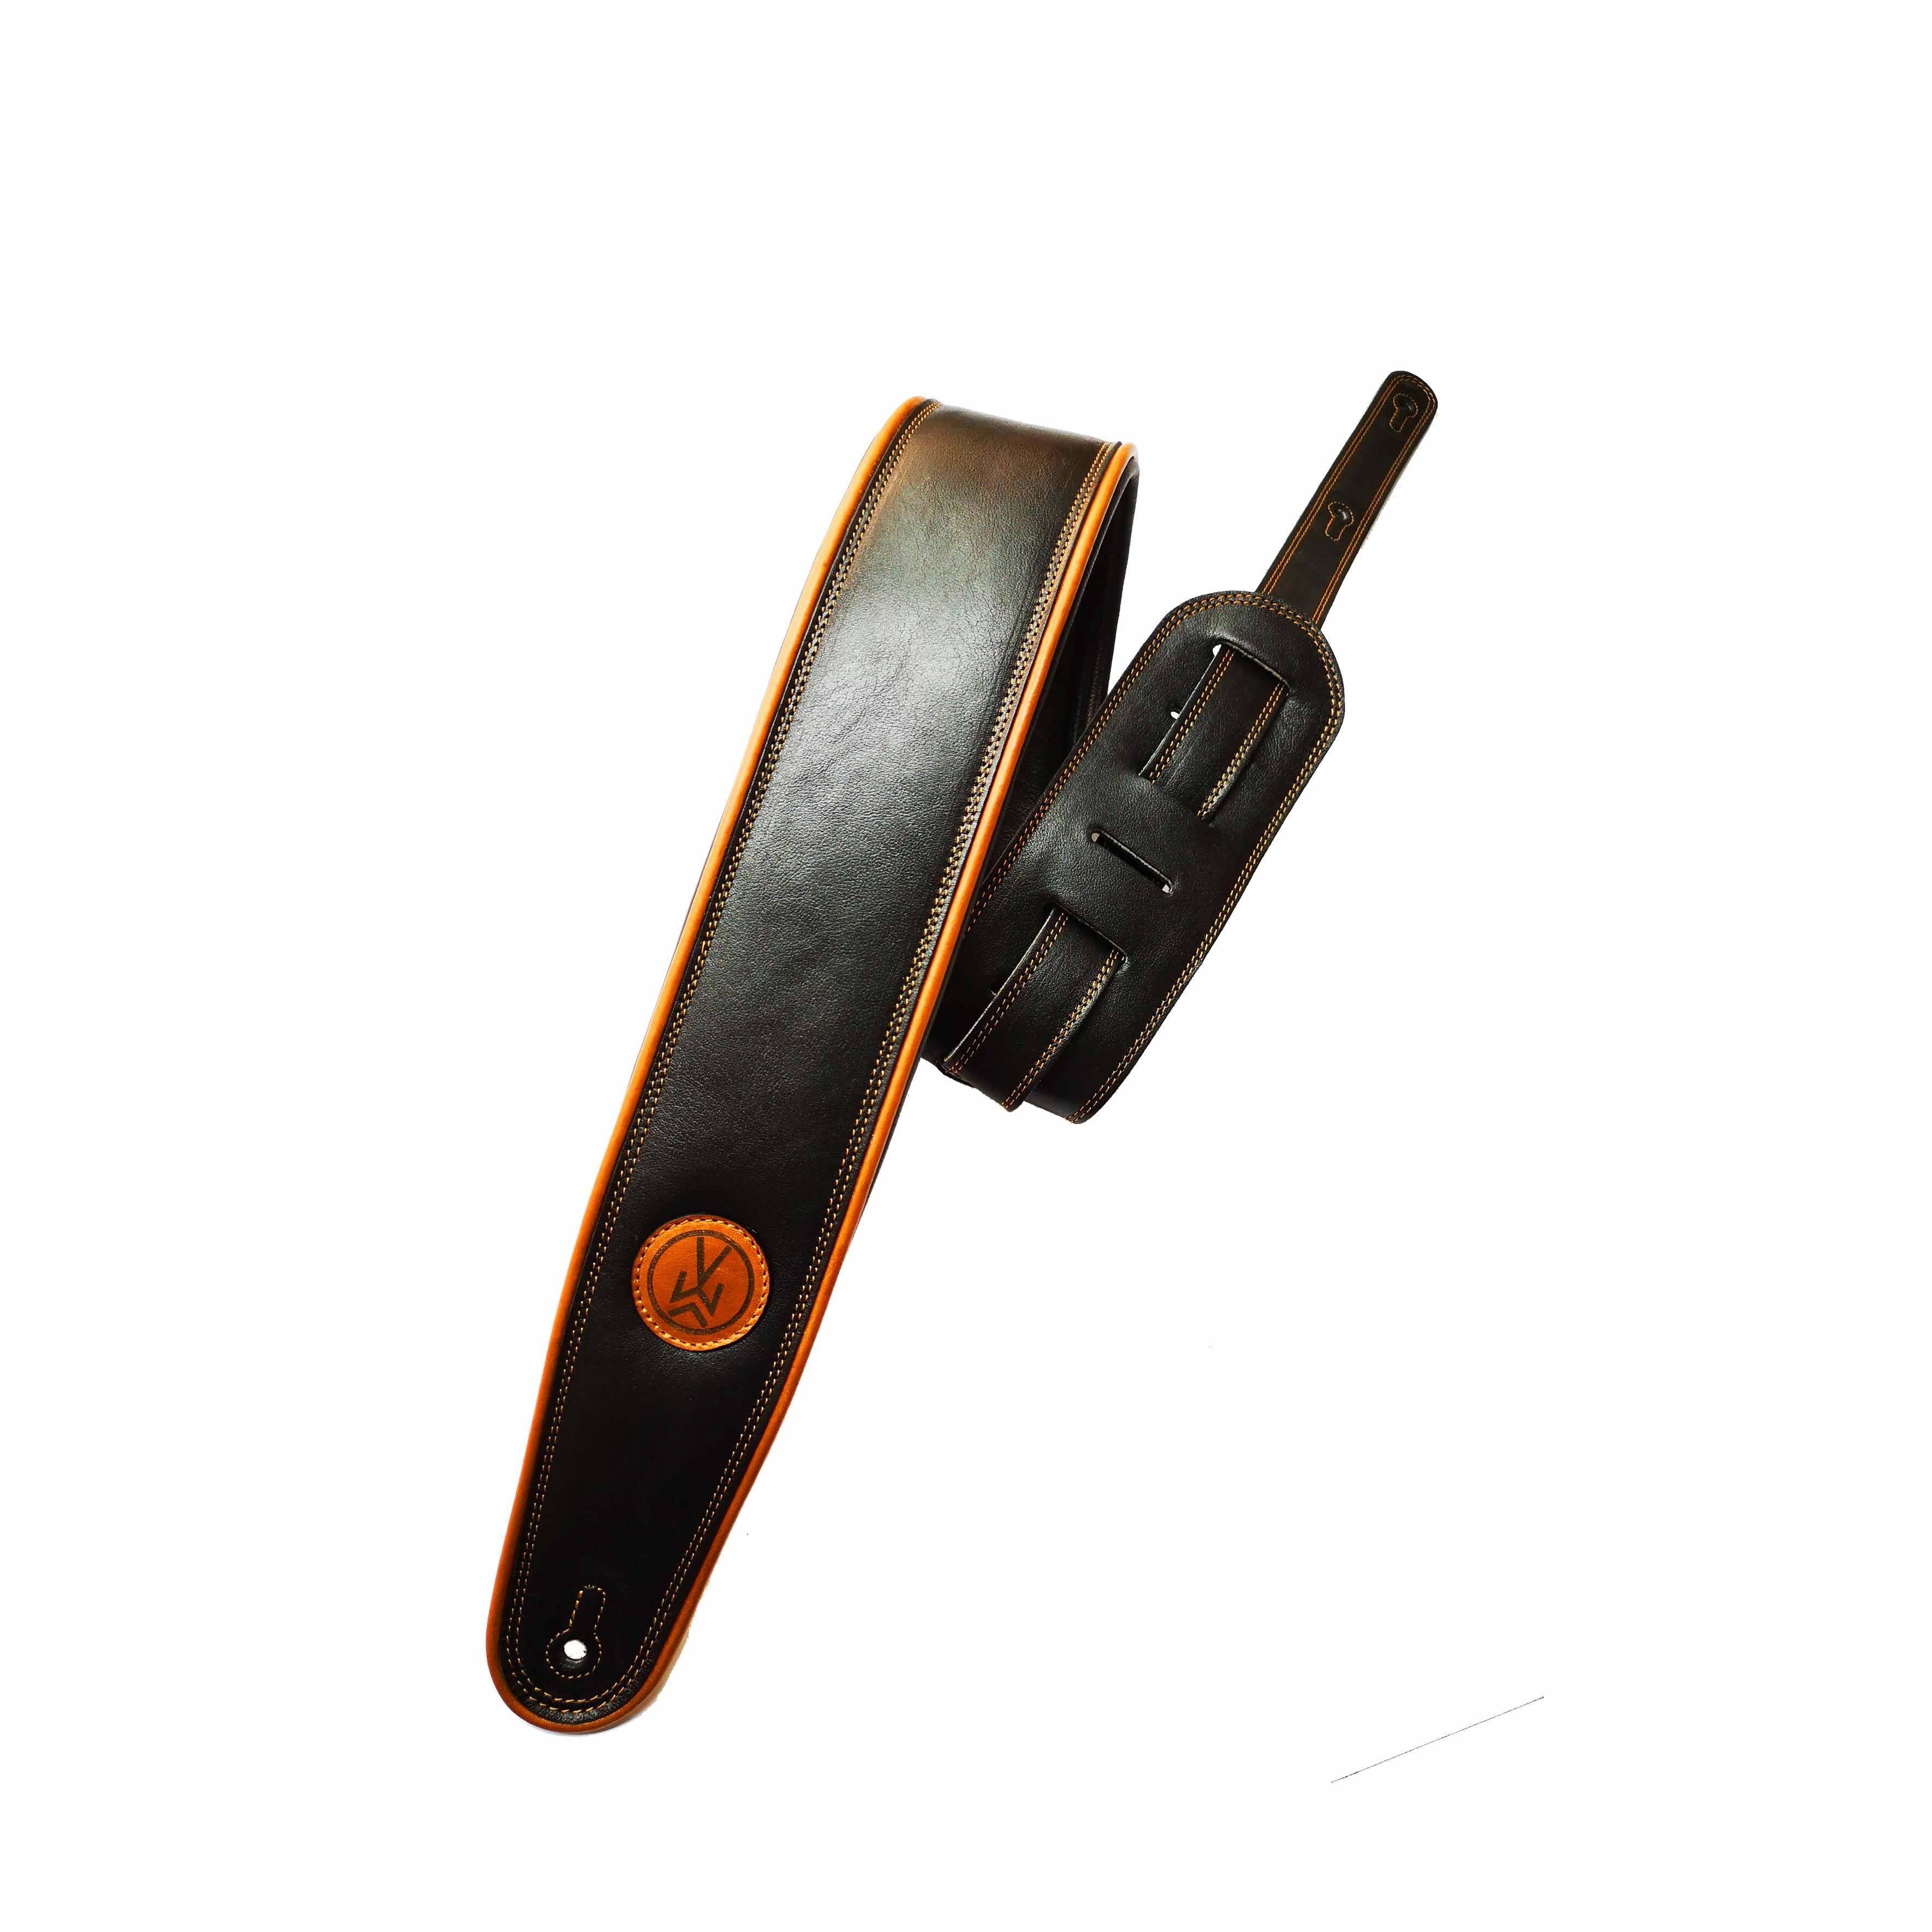 "VW SIGNATURE 3"" Black / Brown (Padded, Genuine Leather) VW301-BK-BR"